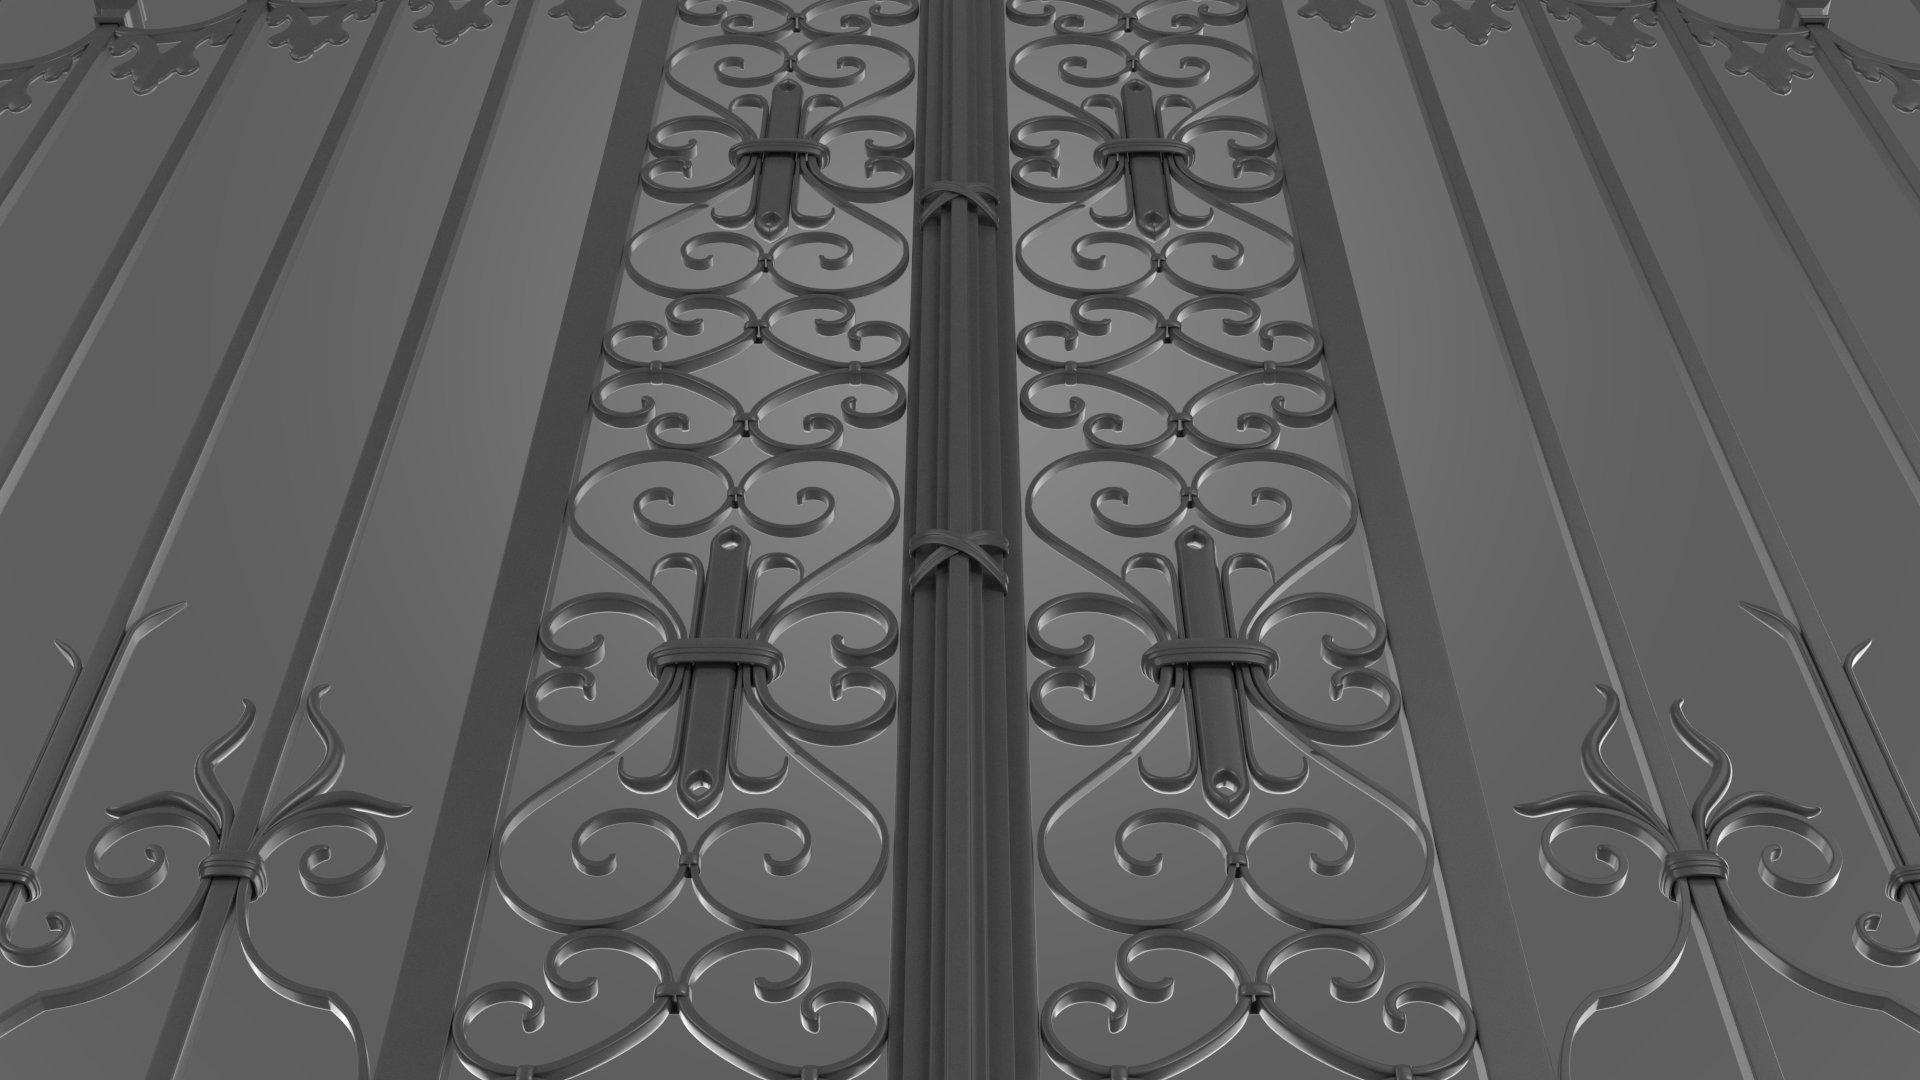 Stavros fylladitis gate 03